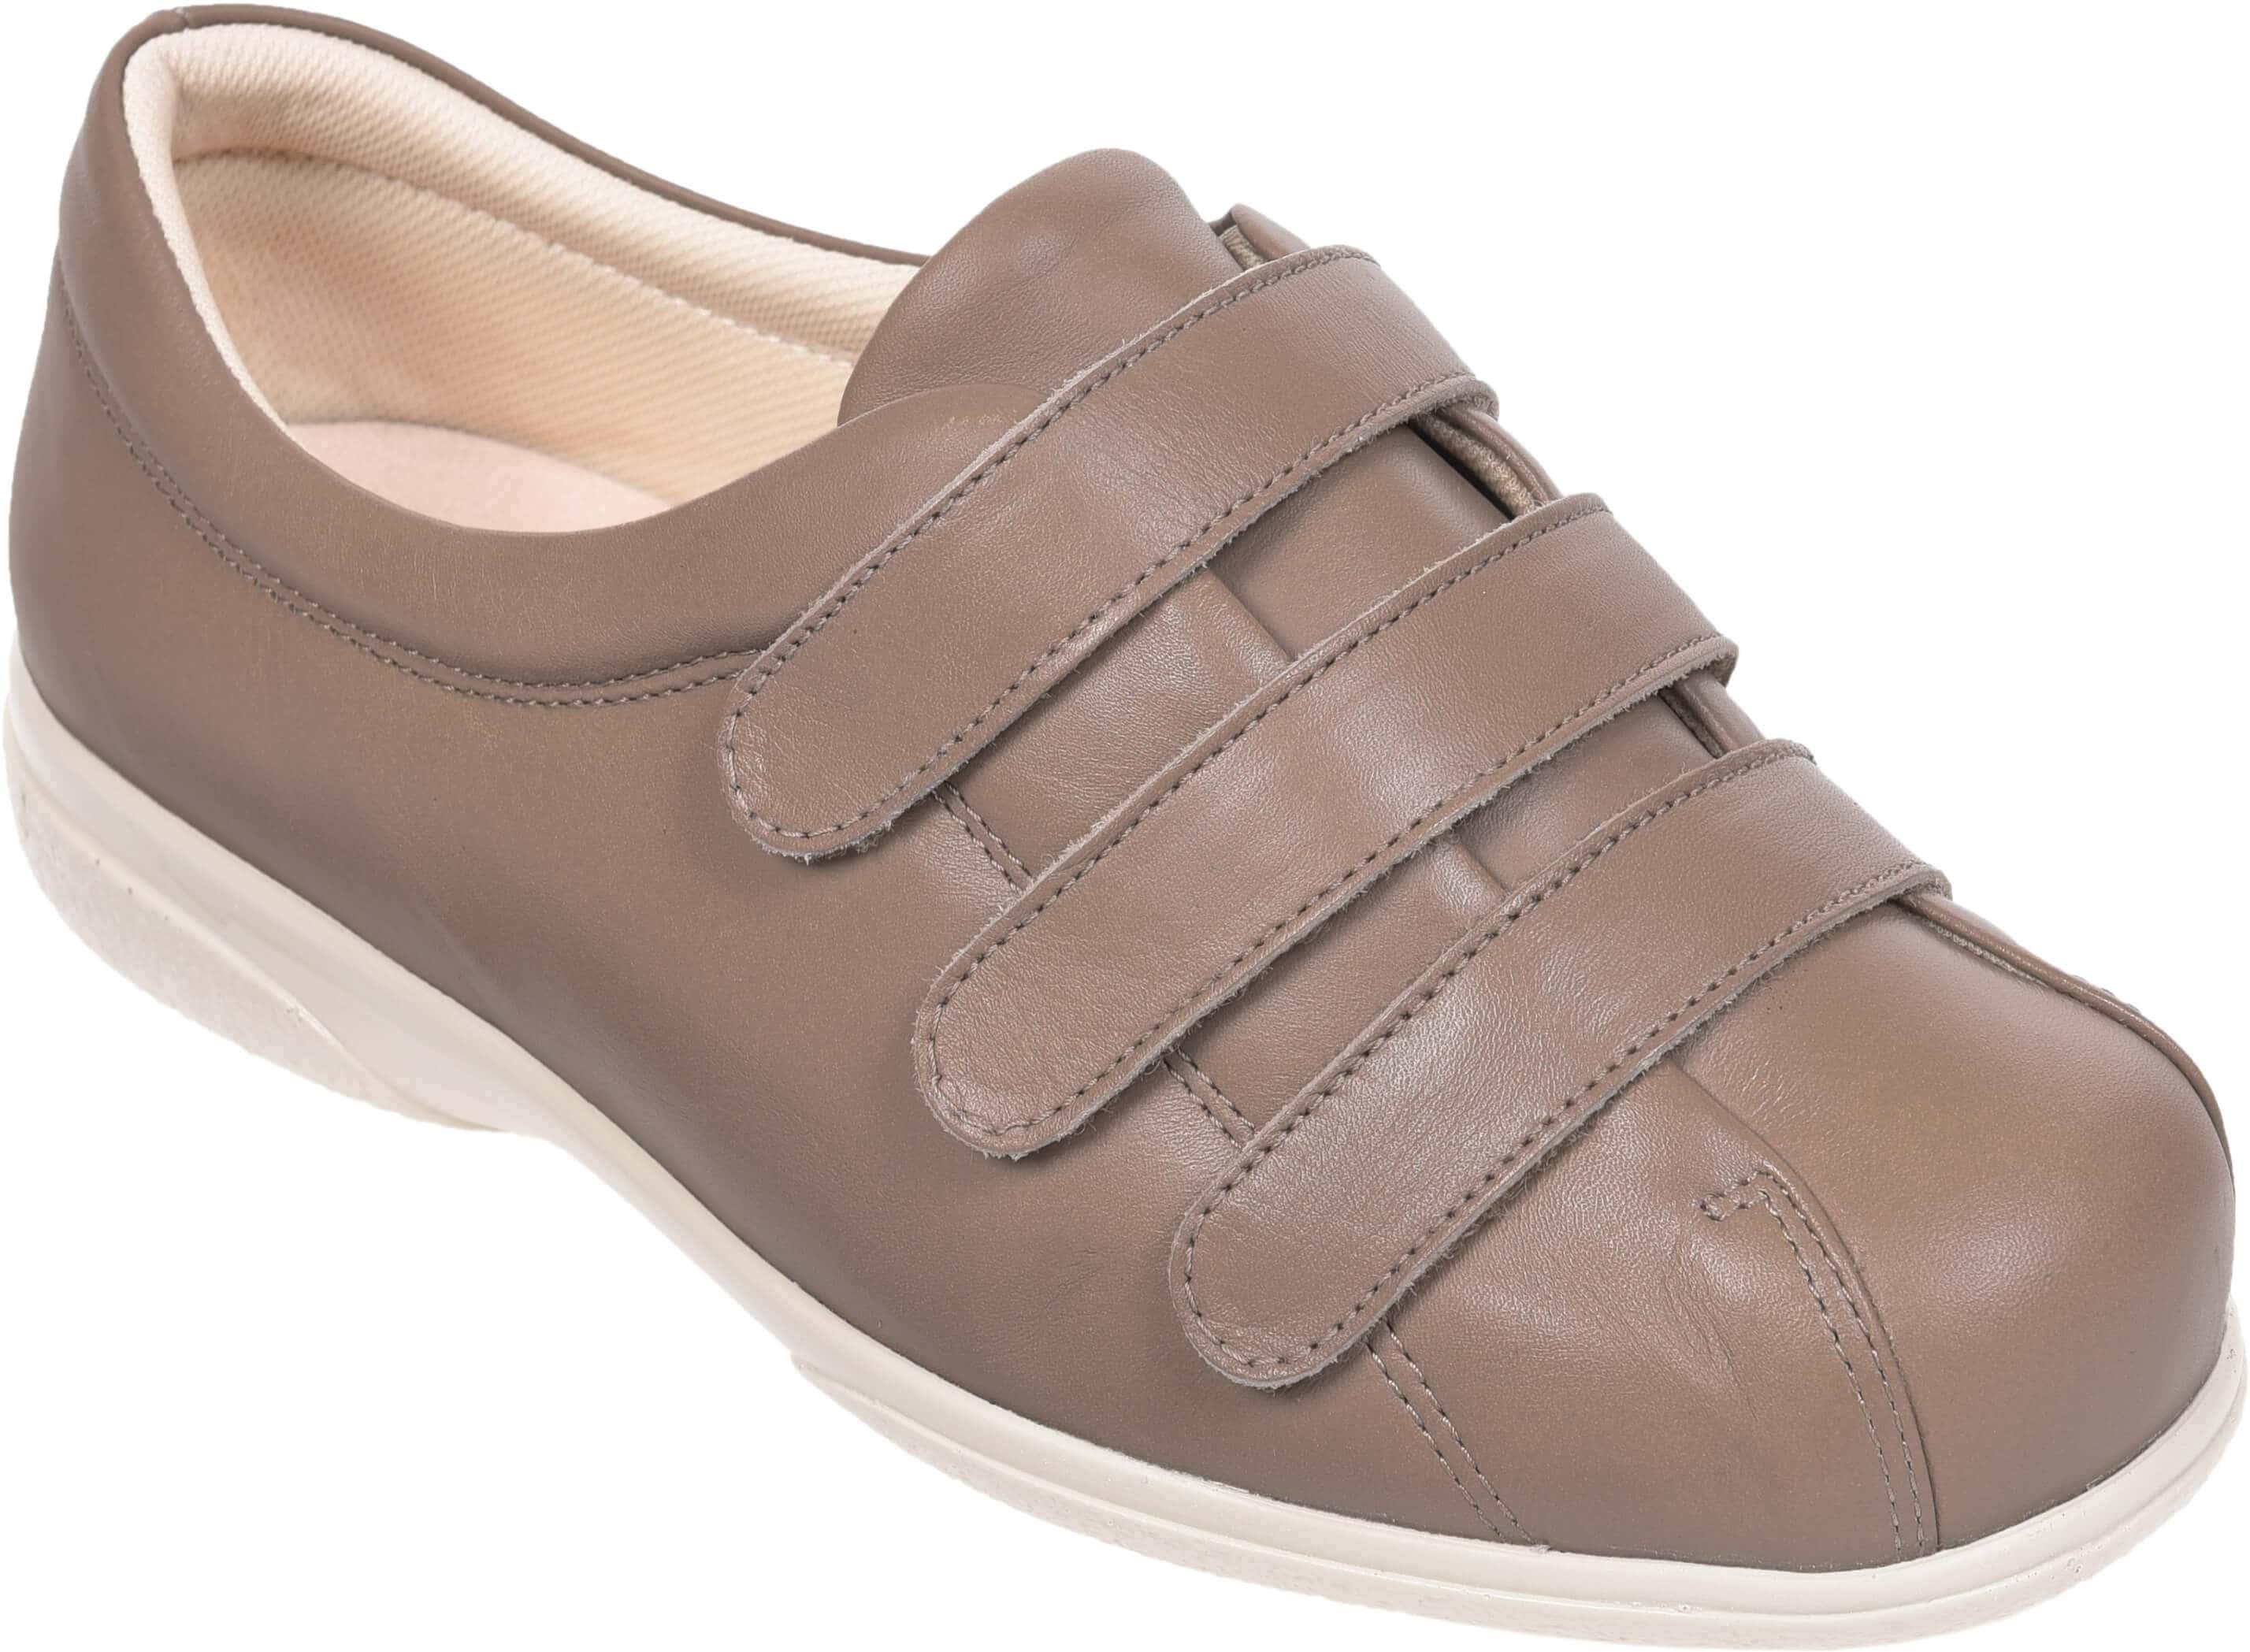 Premier supplier of Cosyfeet footwear